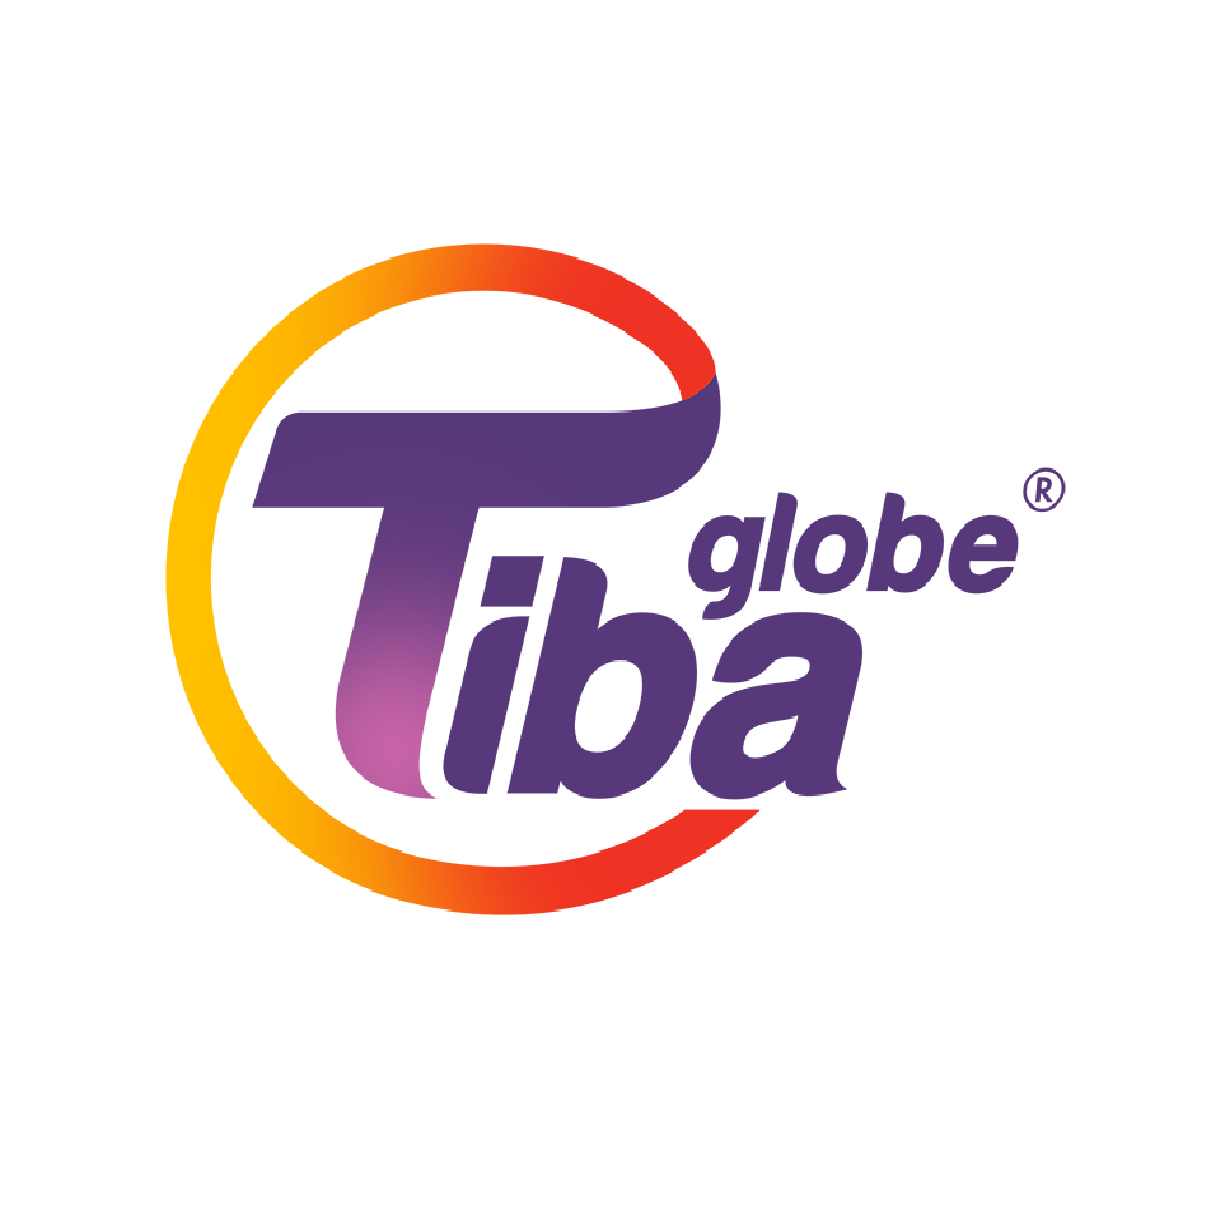 TibaGlobe